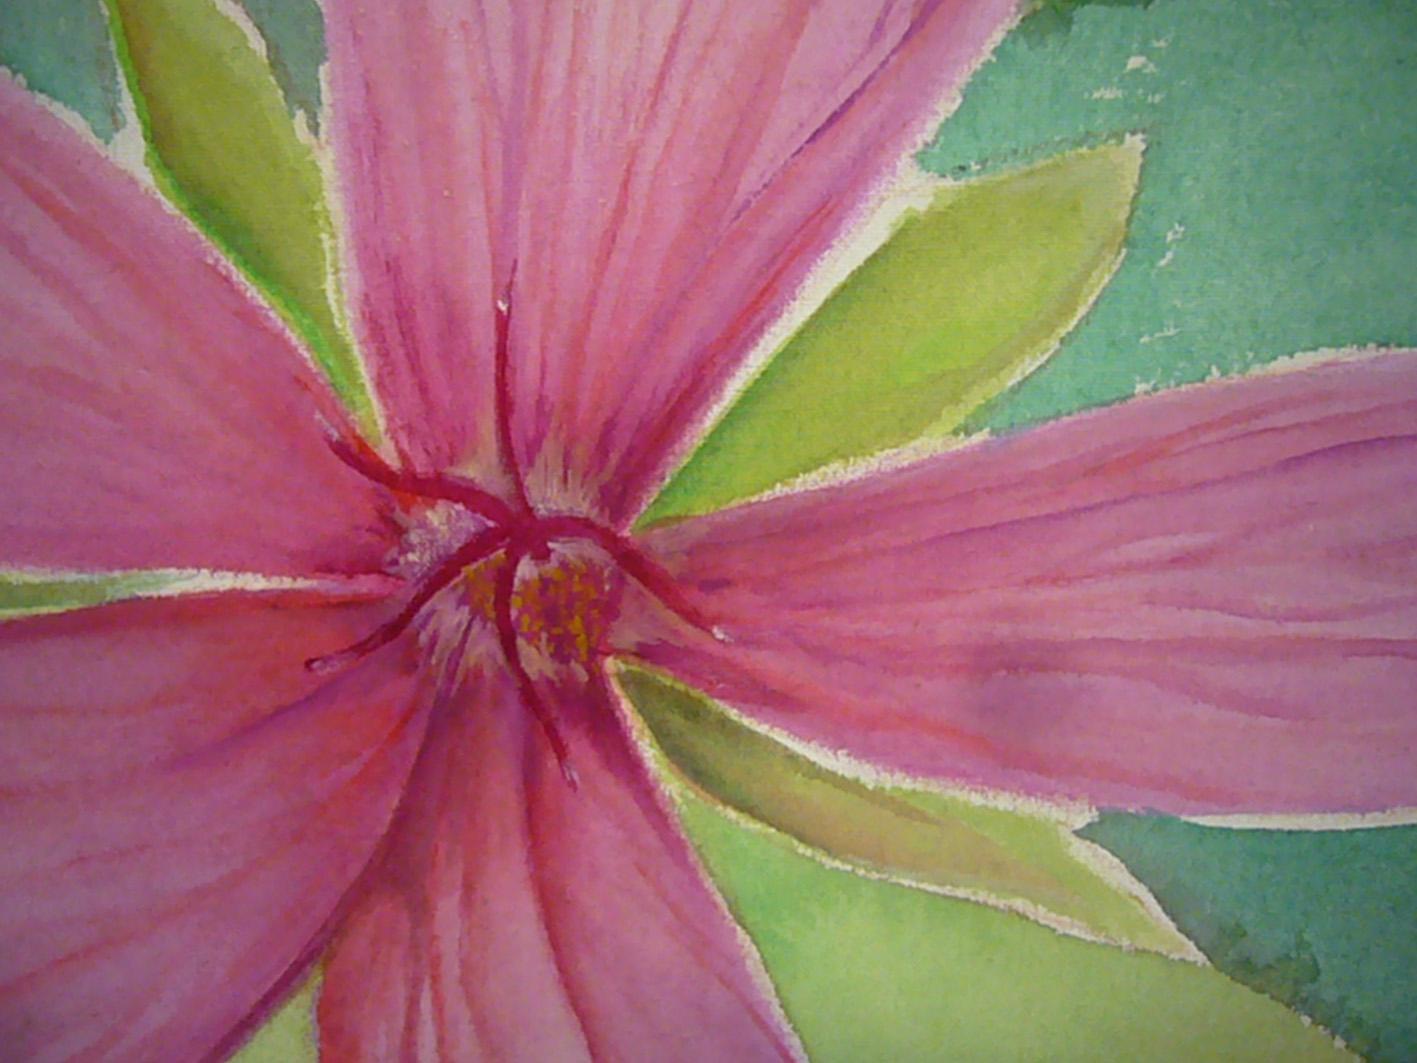 Cuadros con flores cuadros - Cuadros flores modernas ...